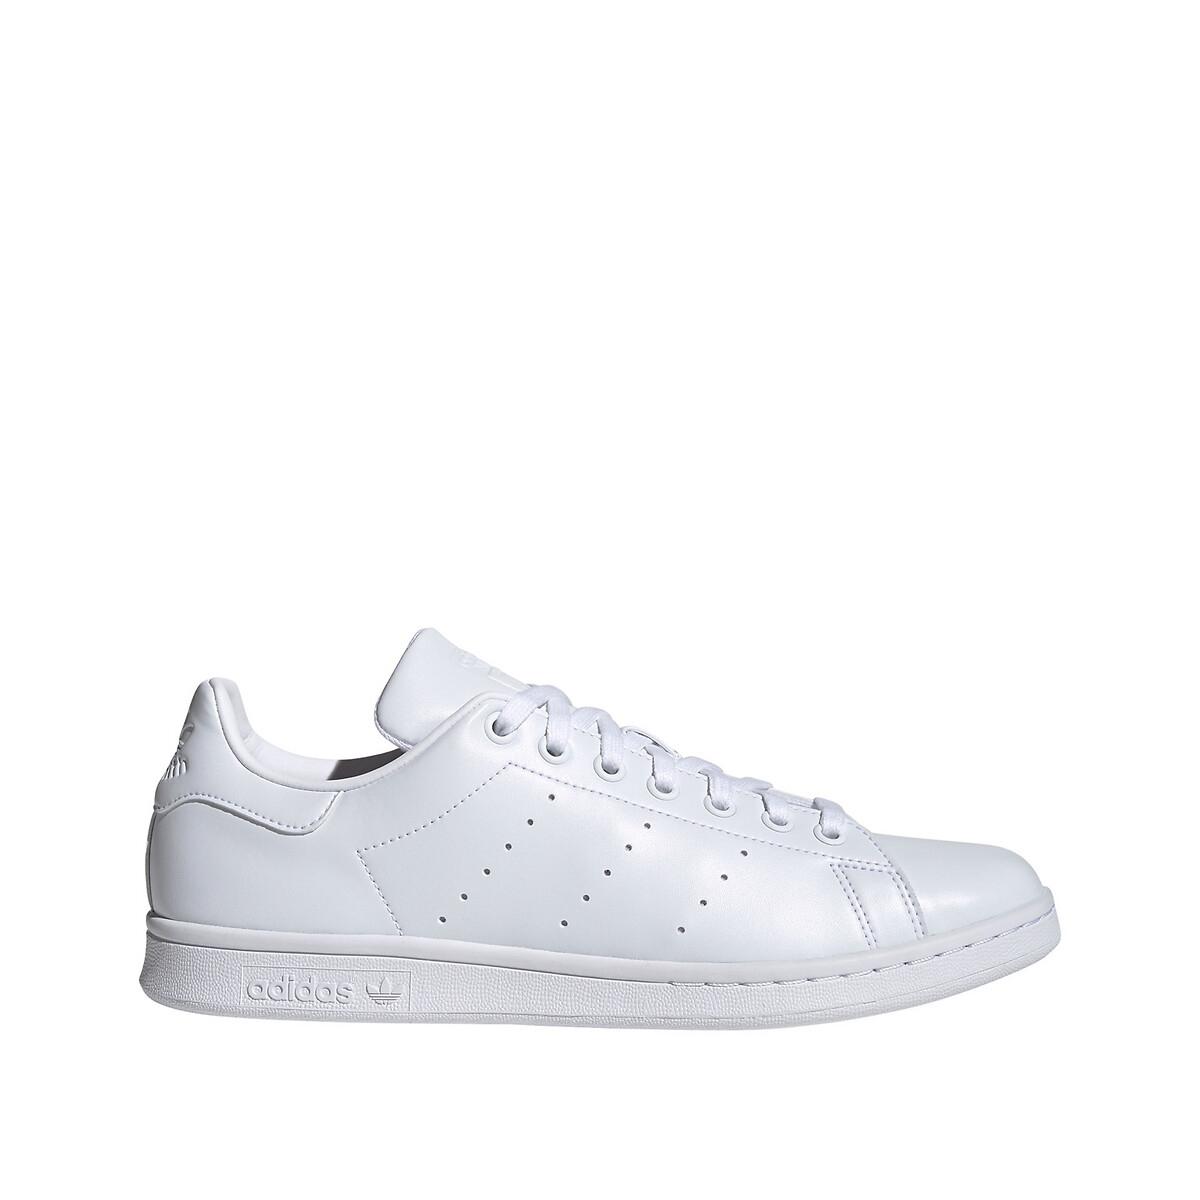 Adidas Originals Stan Smith Schoenen Cloud White / Cloud White / Core Black Heren online kopen